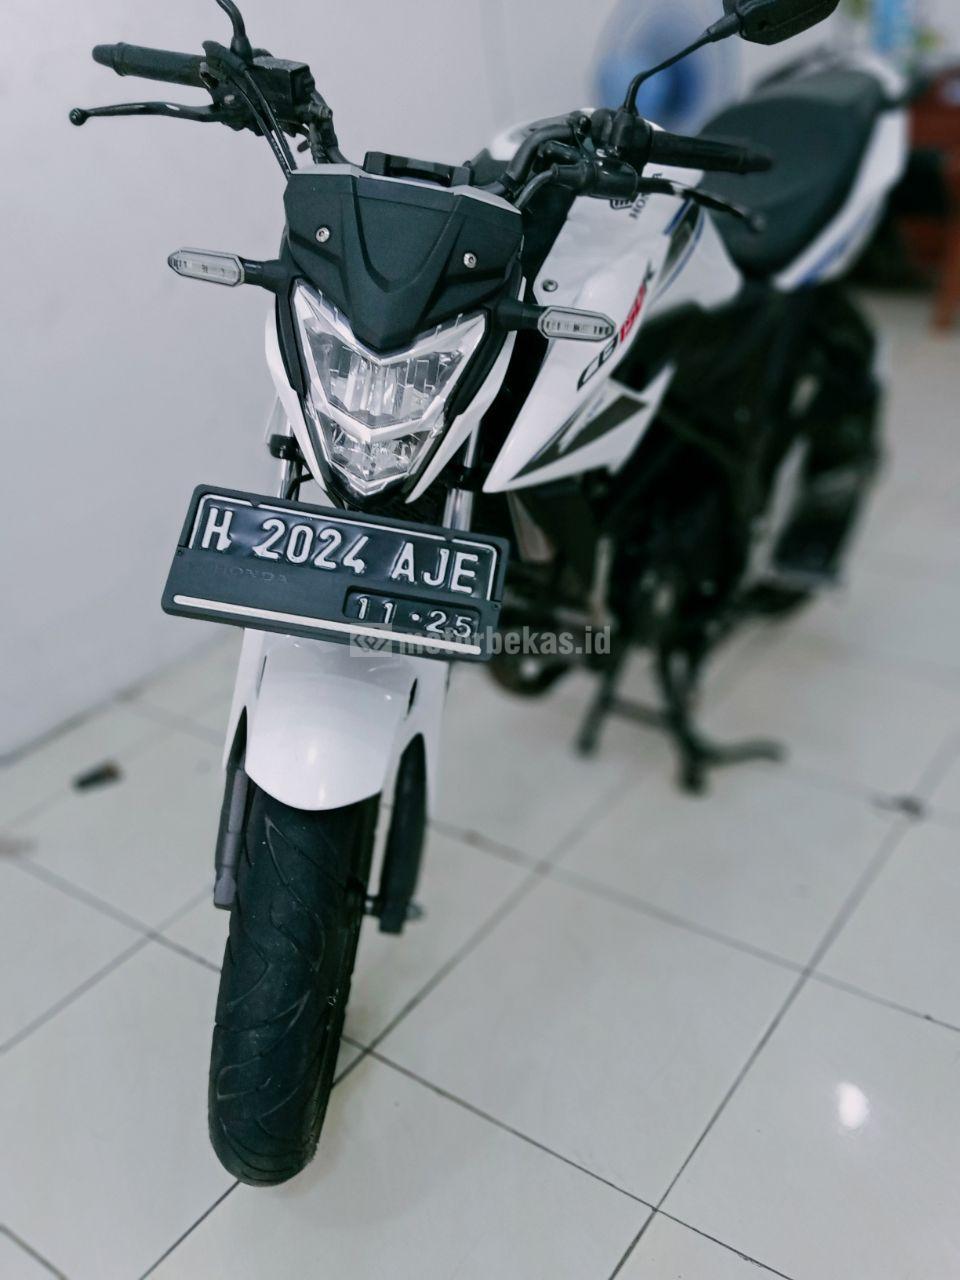 HONDA CB 150R FI 950 motorbekas.id